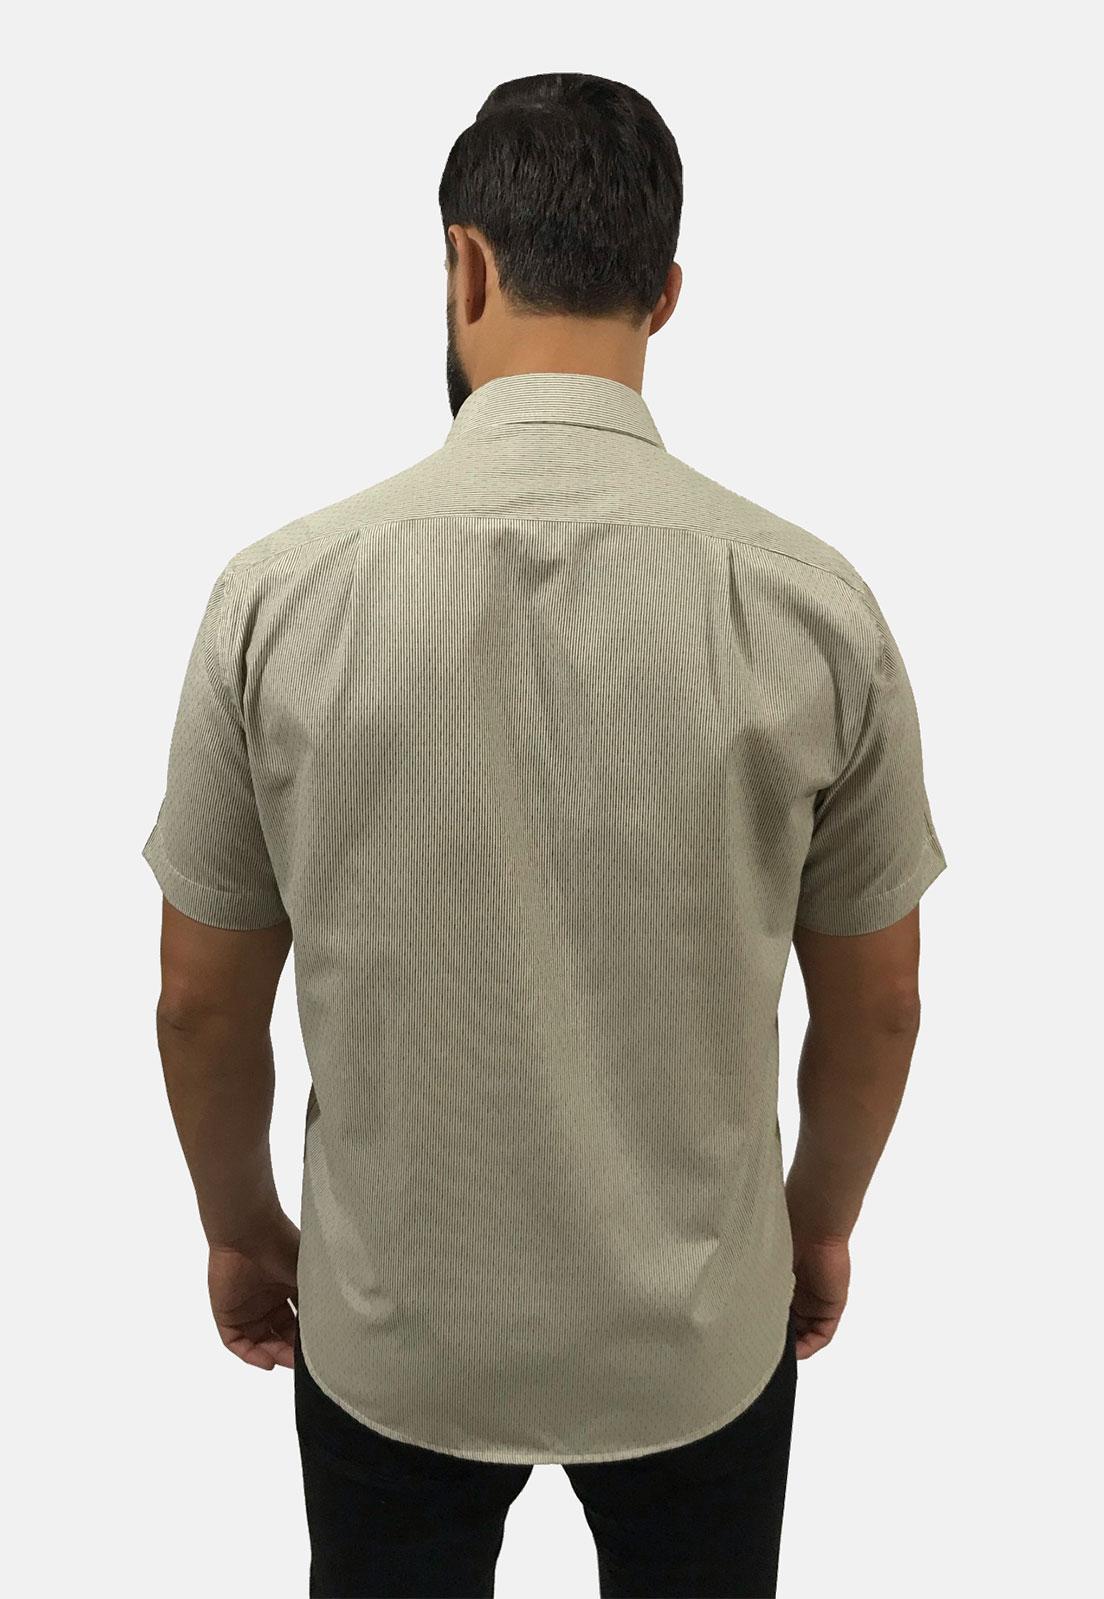 Camisa Social Masculina Olimpo Listra Fina Maquinetada com Bolso Manga Curta